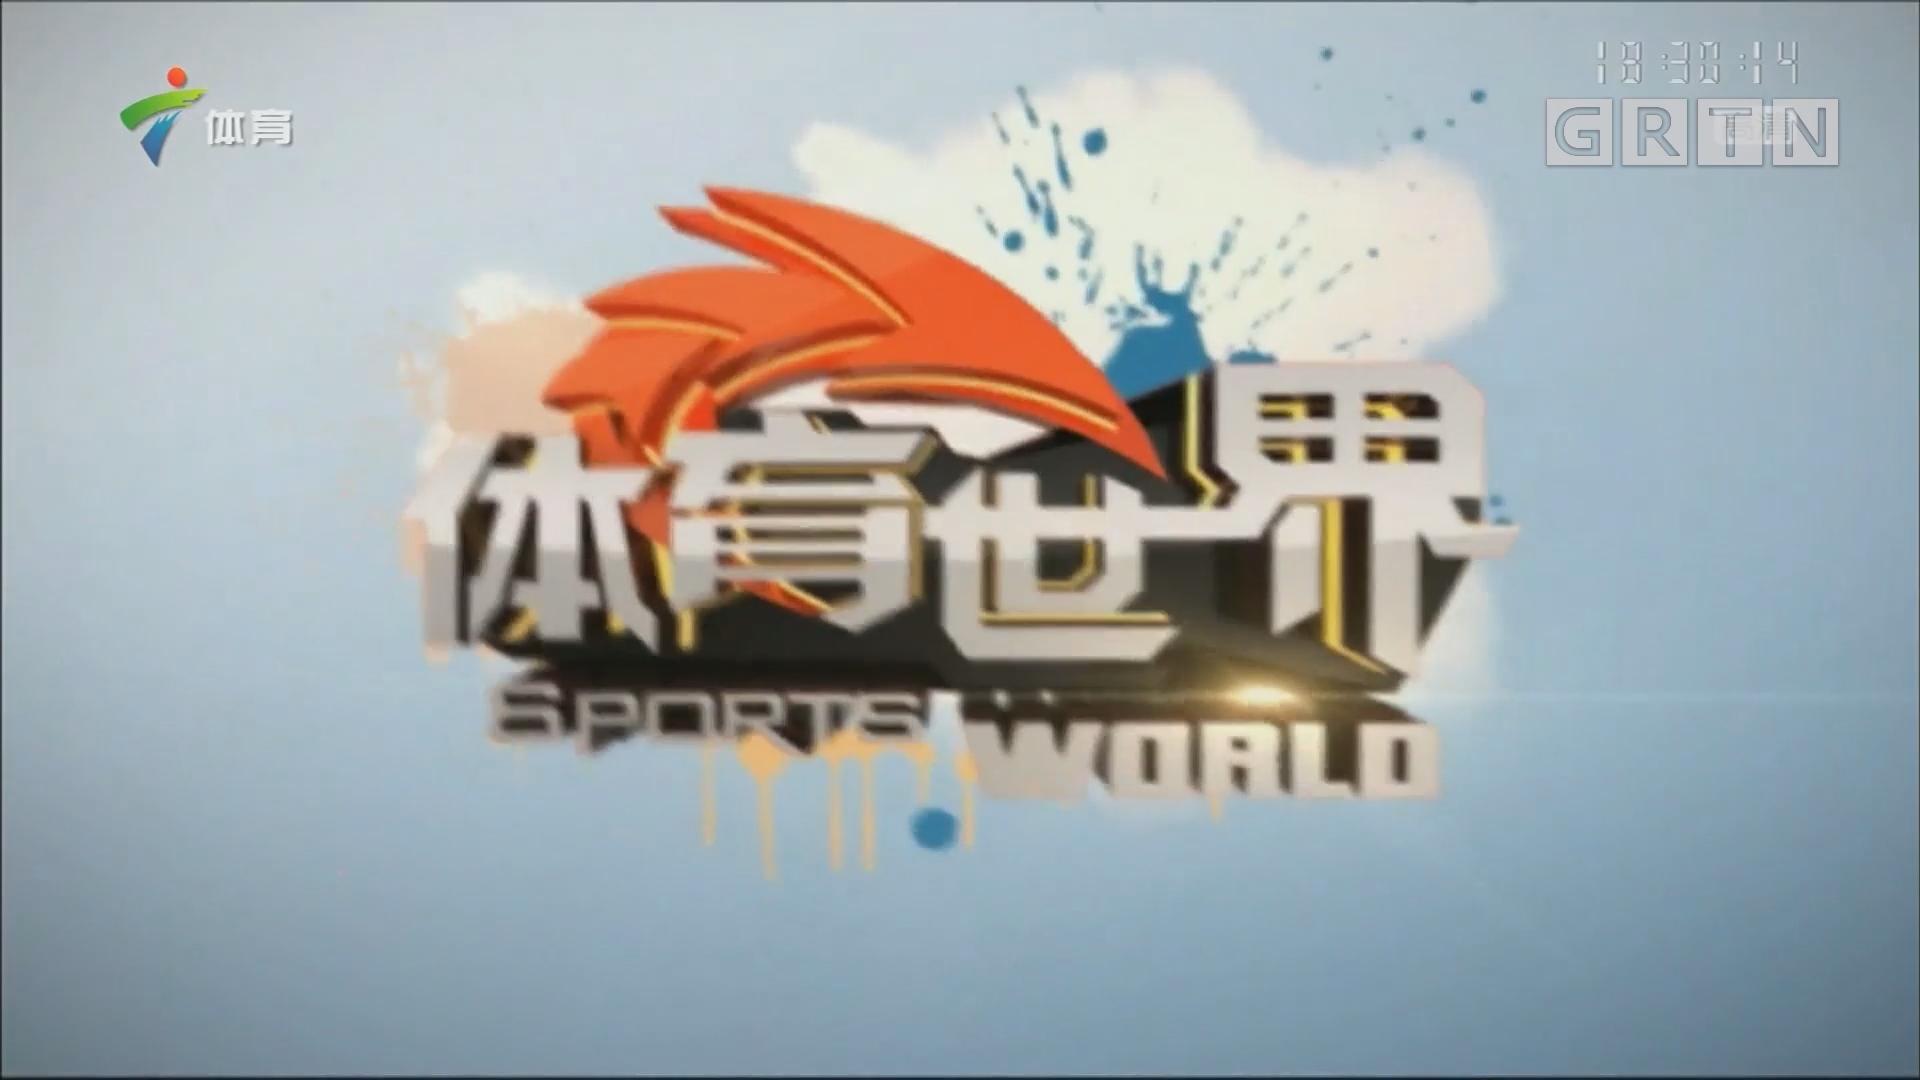 [HD][2018-01-09]体育世界:达喀尔拉力赛第三赛段 阿尔·阿提亚夺冠